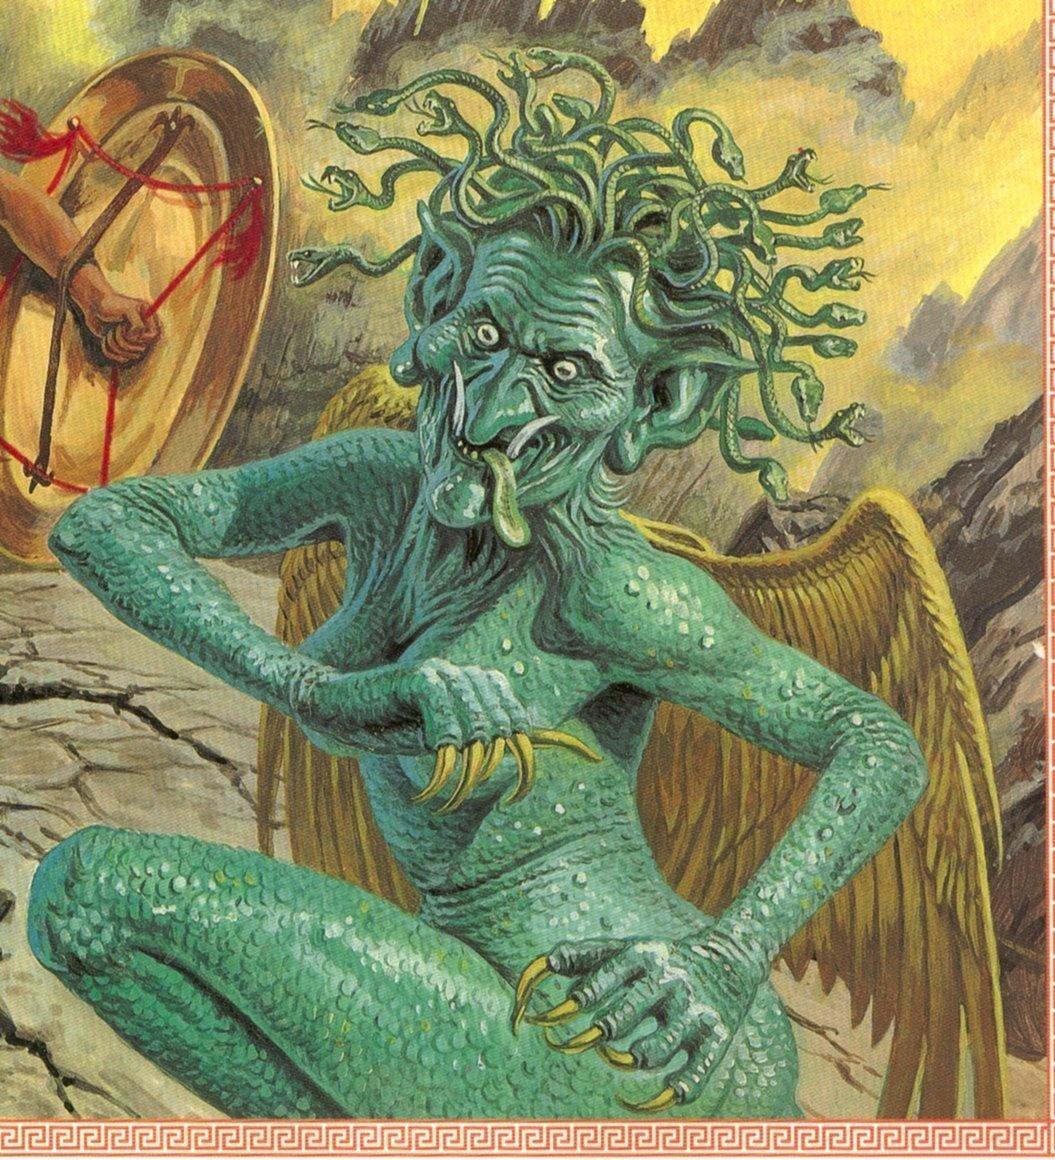 Gorgon - Warriors Of Myth Wiki | 1055 x 1160 jpeg 328kB